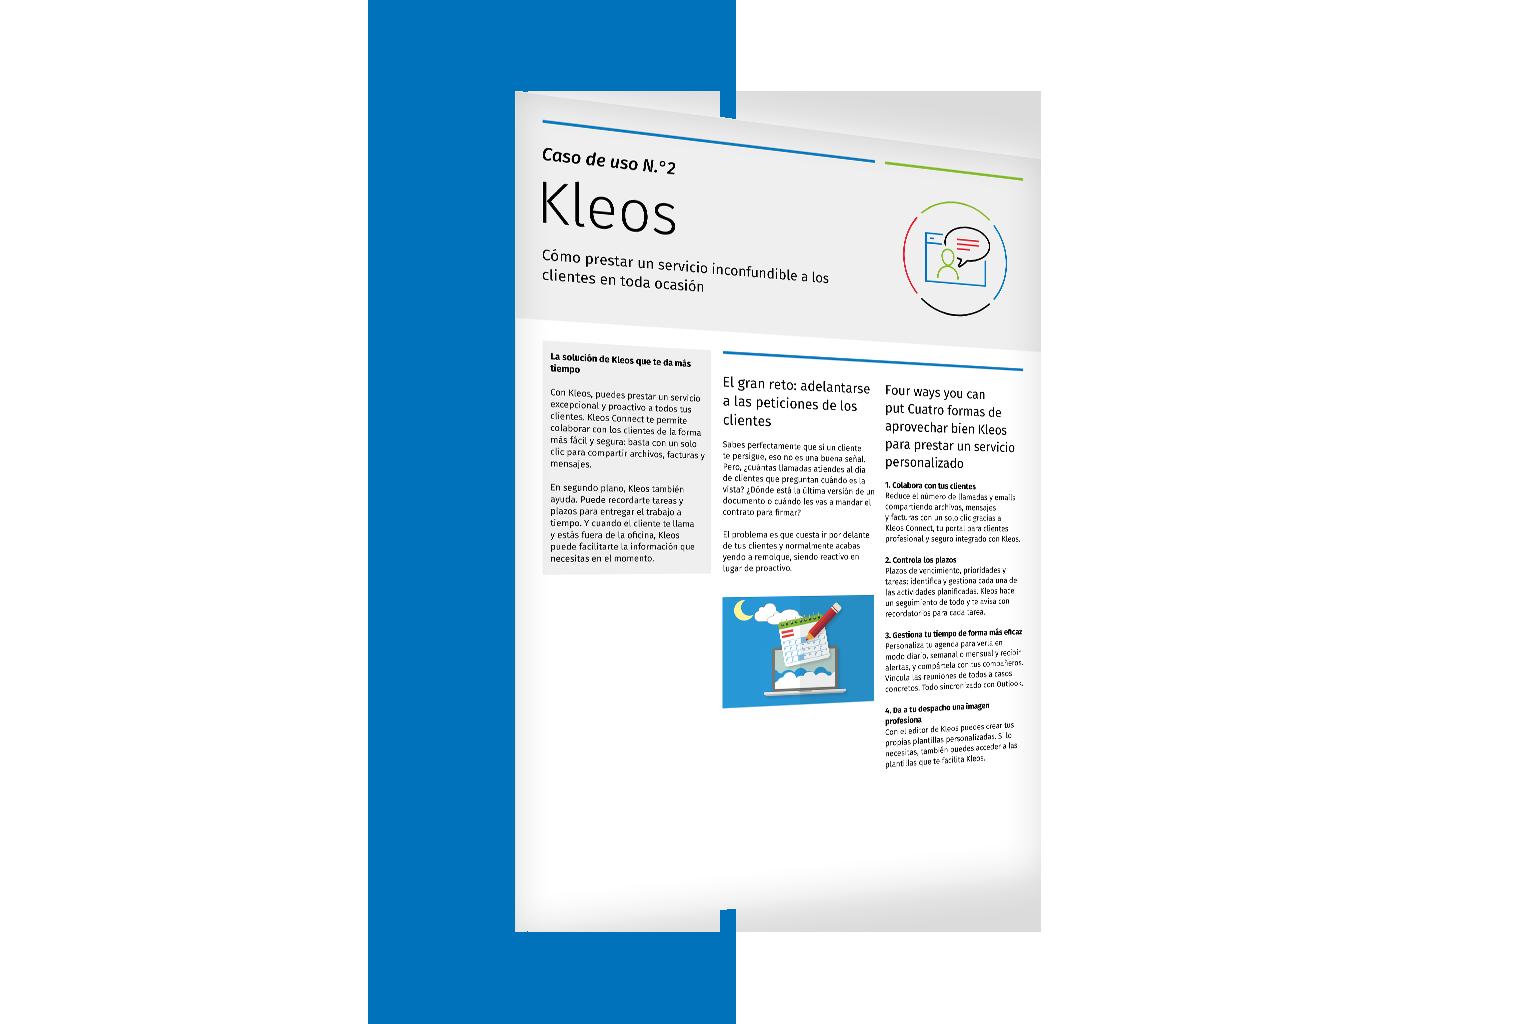 Kleos-Use-Case-2-Client-Service-ES-1536x1024